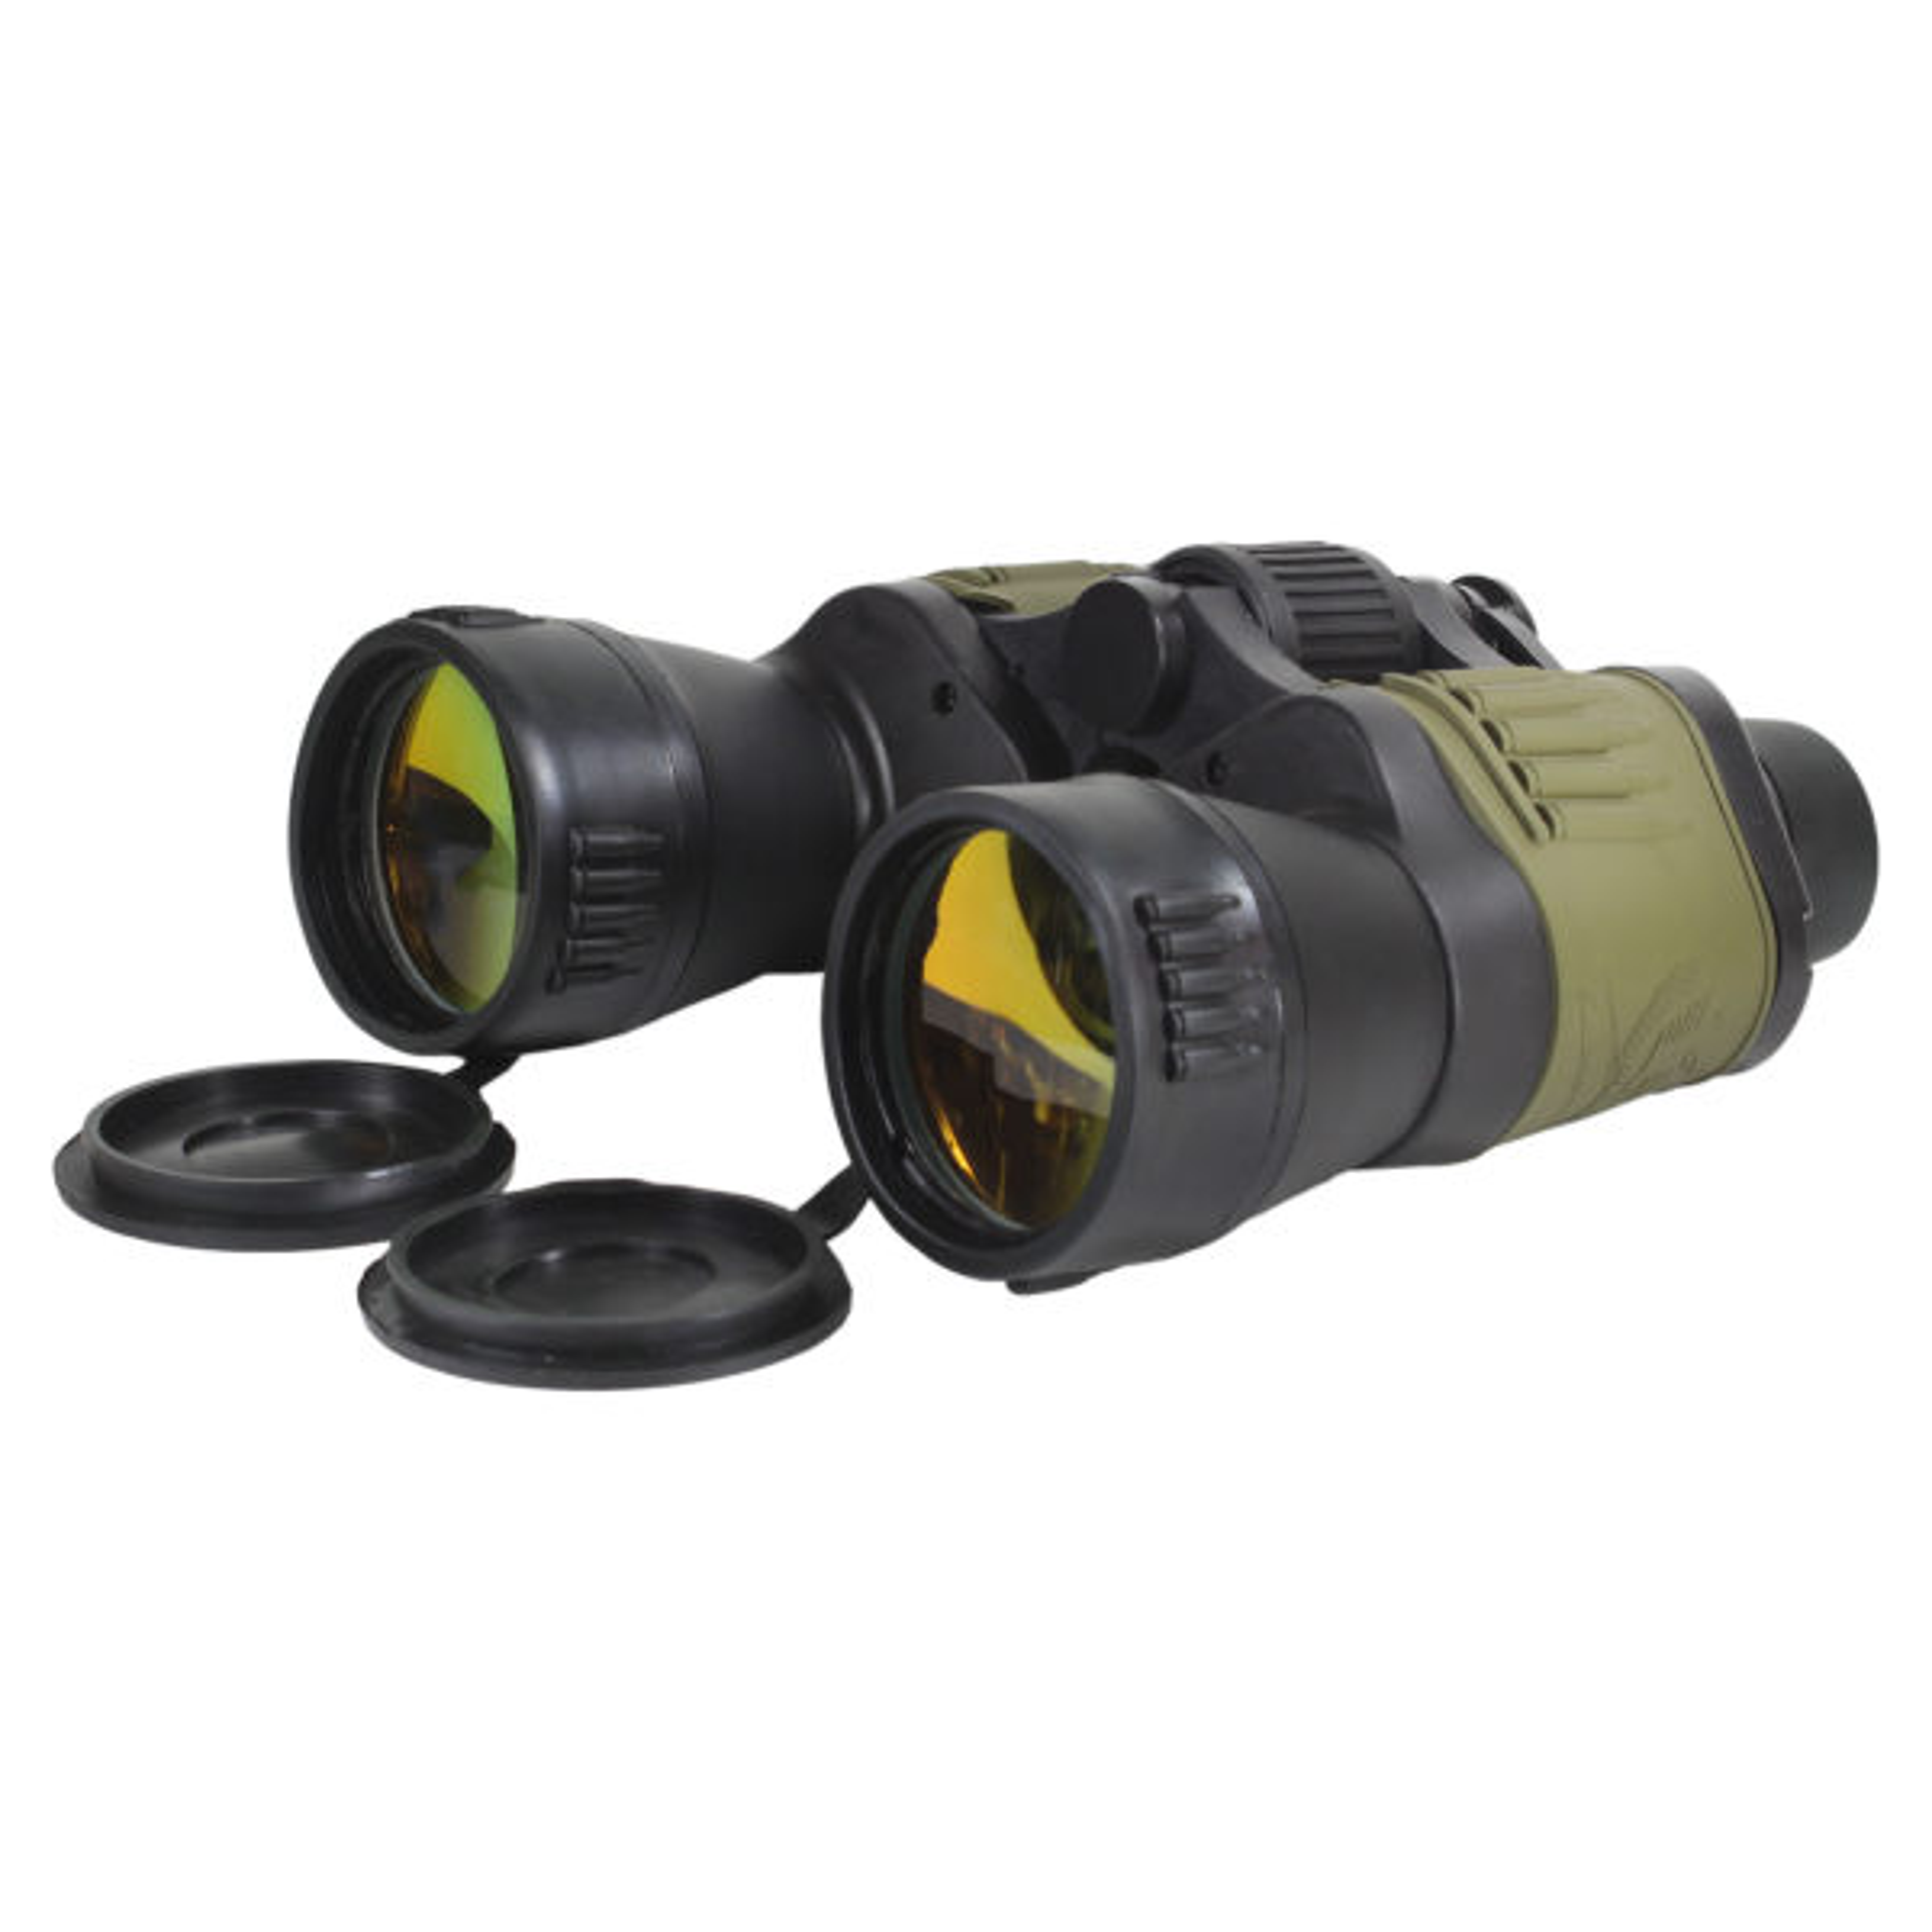 دوربین دوچشمی مدل 10x50 کد 0026